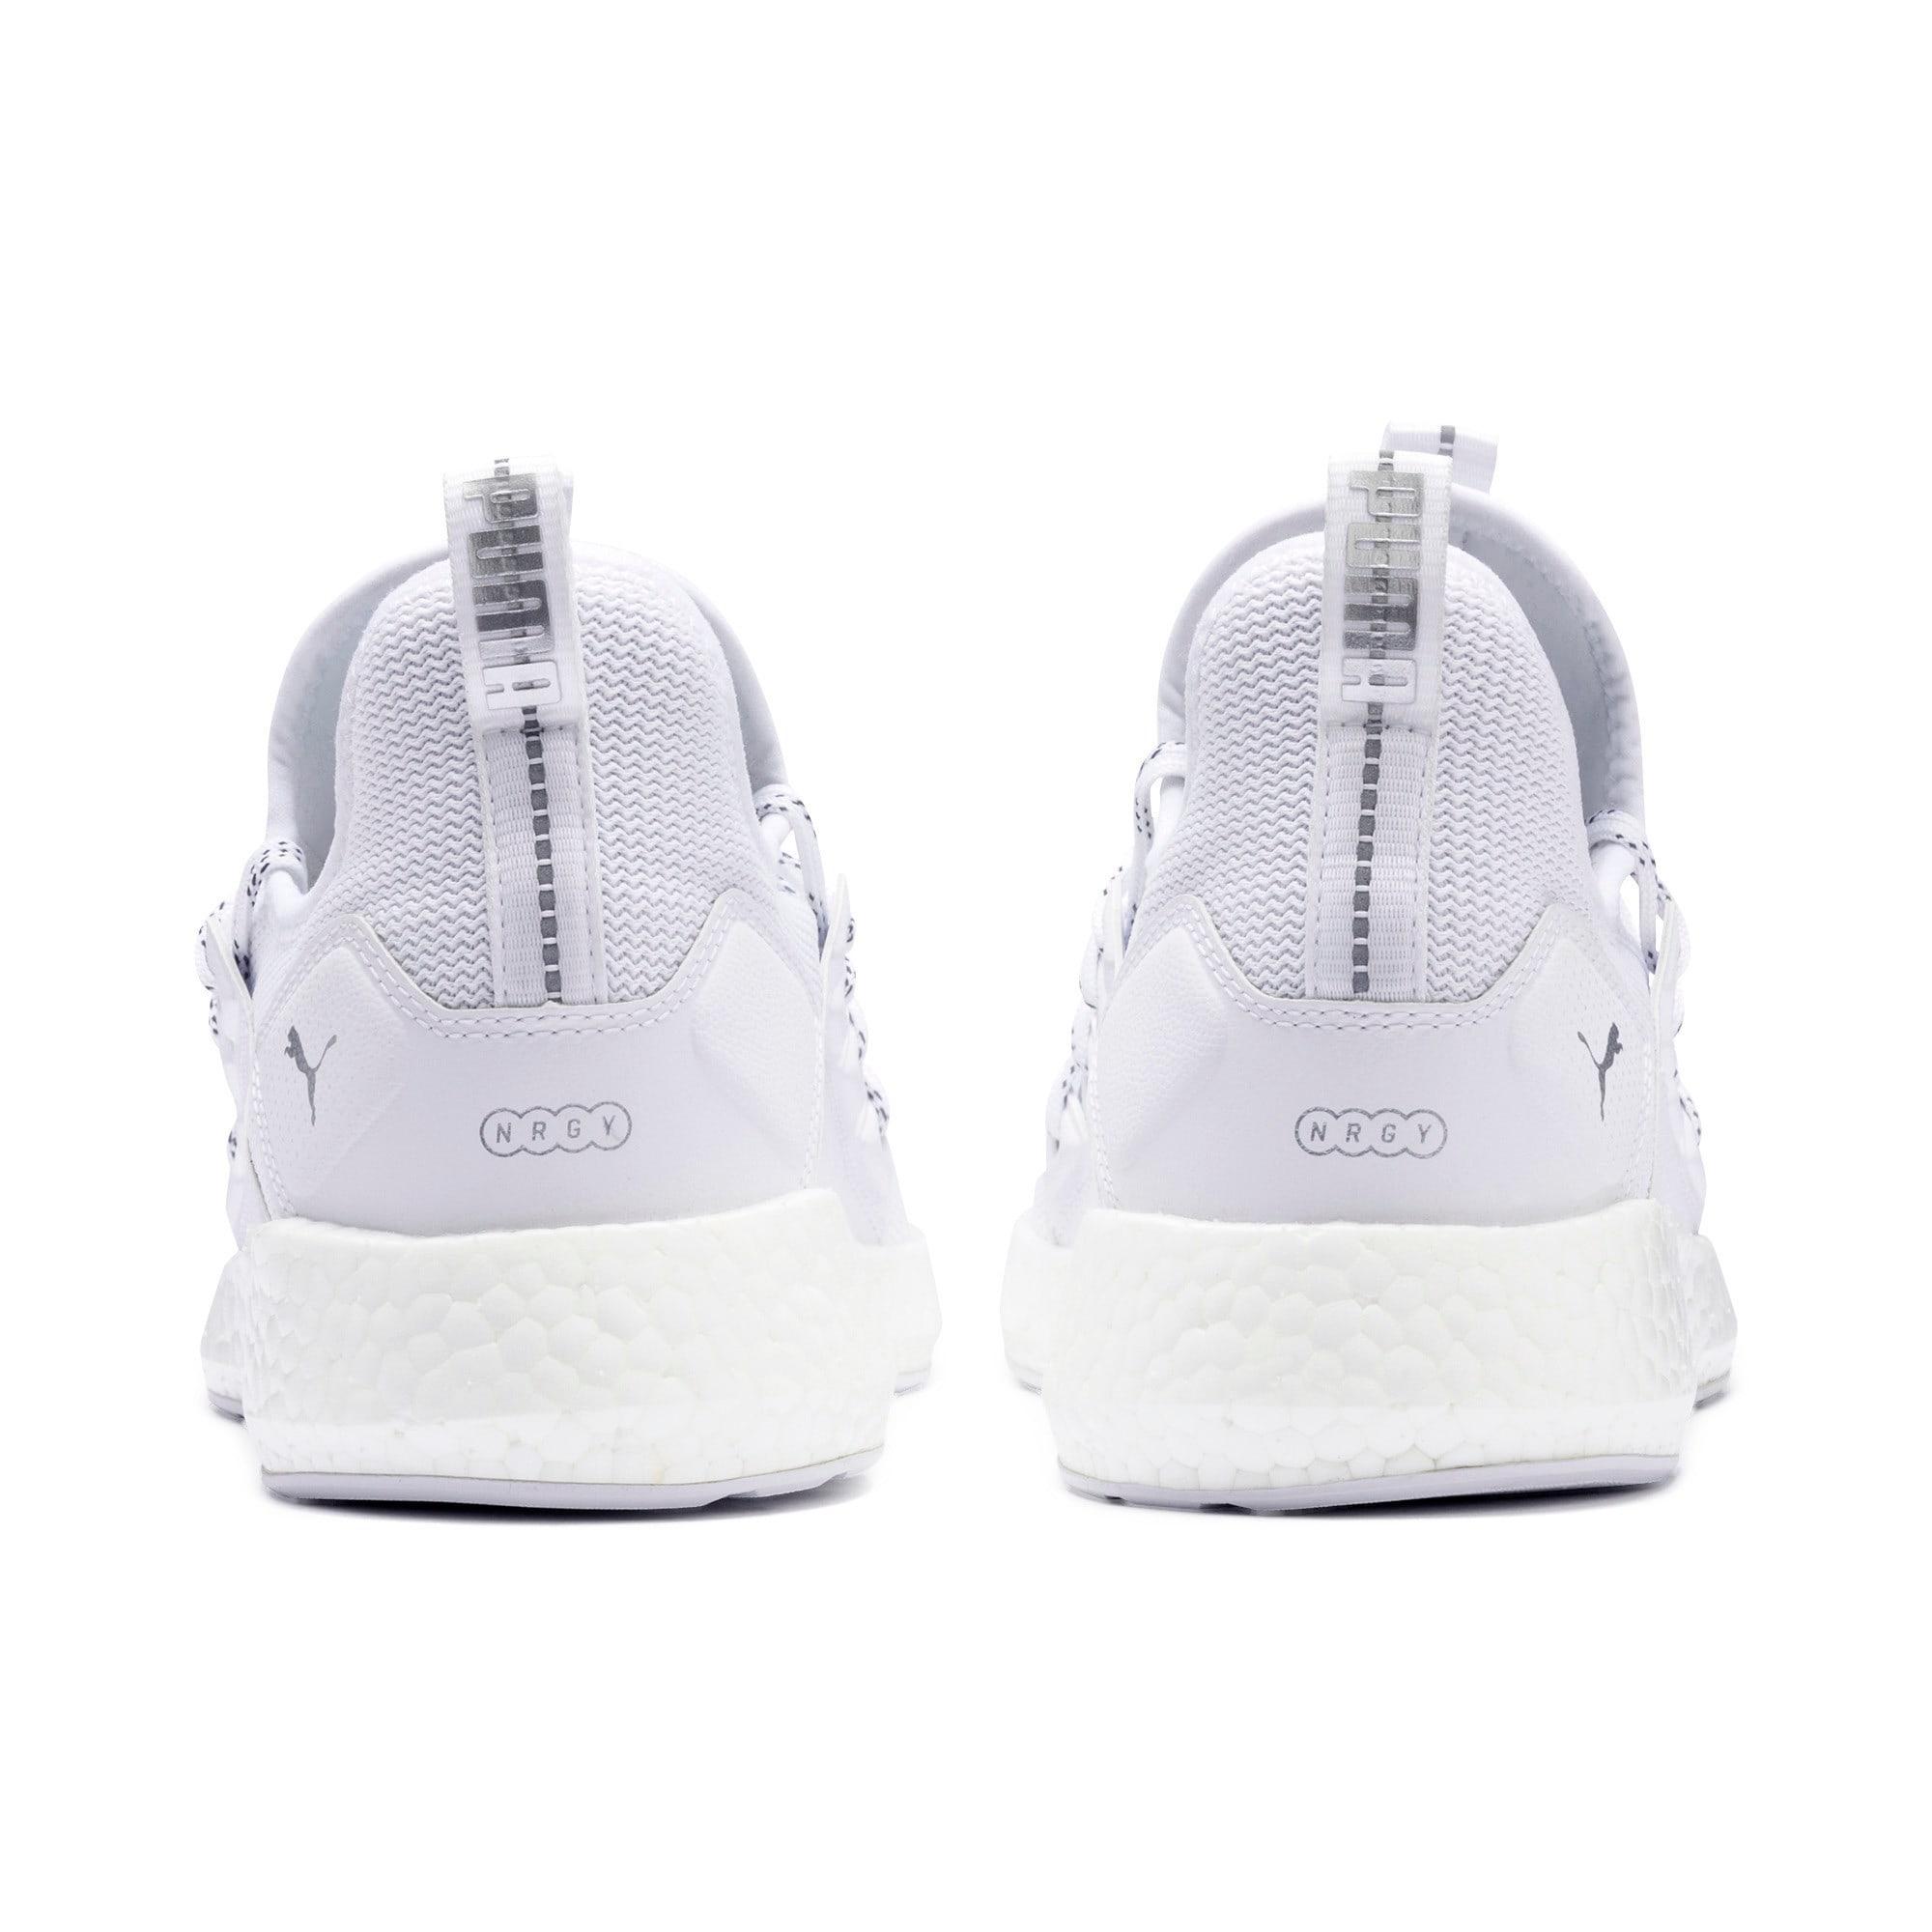 Thumbnail 6 of NRGY Neko Lights Men's Running Shoes, Puma White, medium-IND